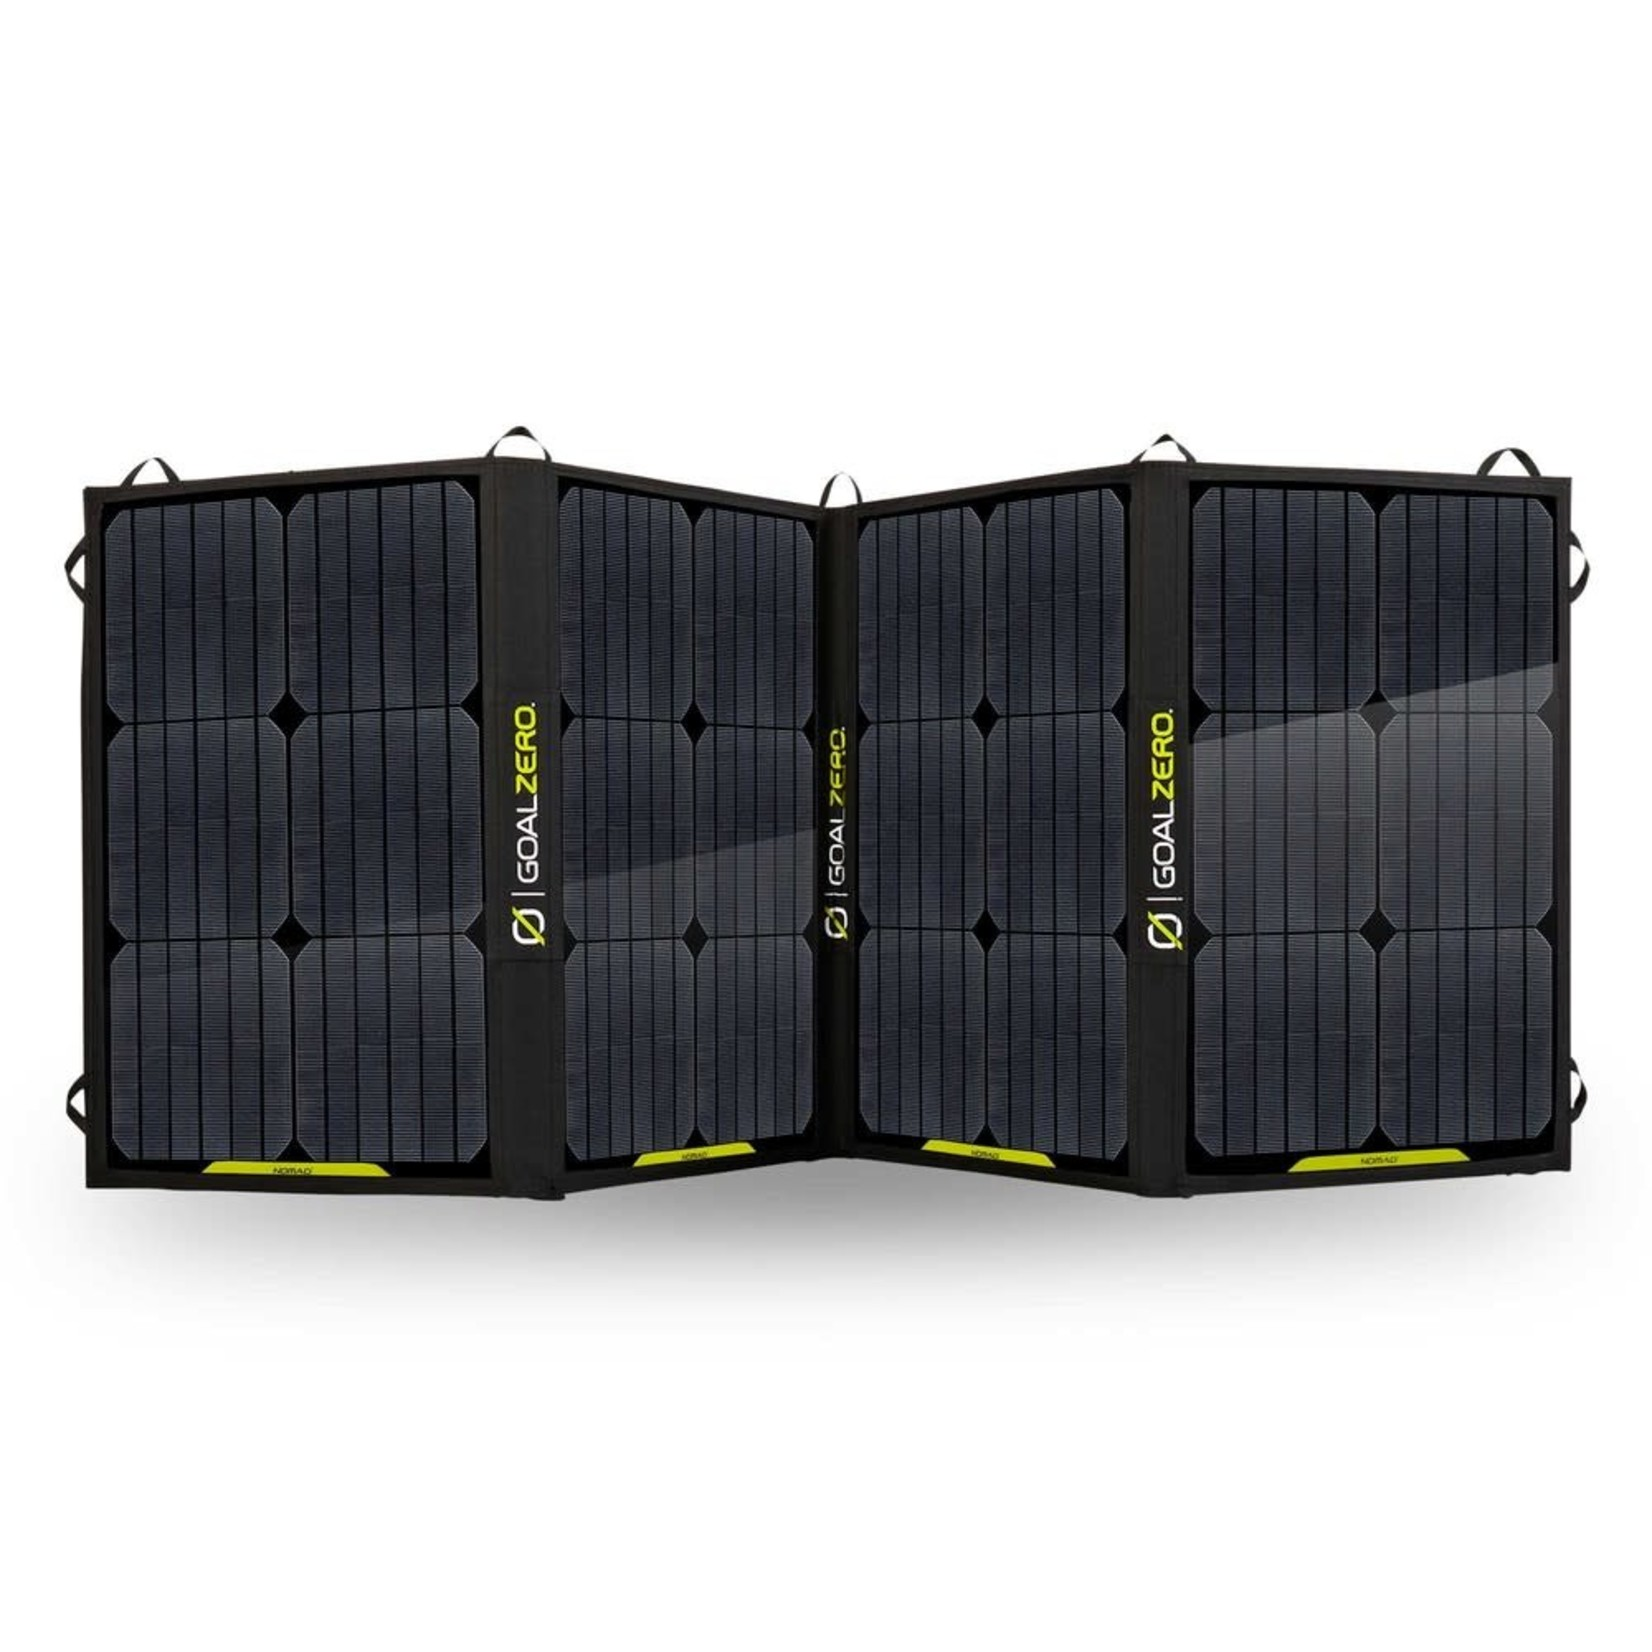 GOALZERO GOAL ZERO Nomad 100 Solar Panel